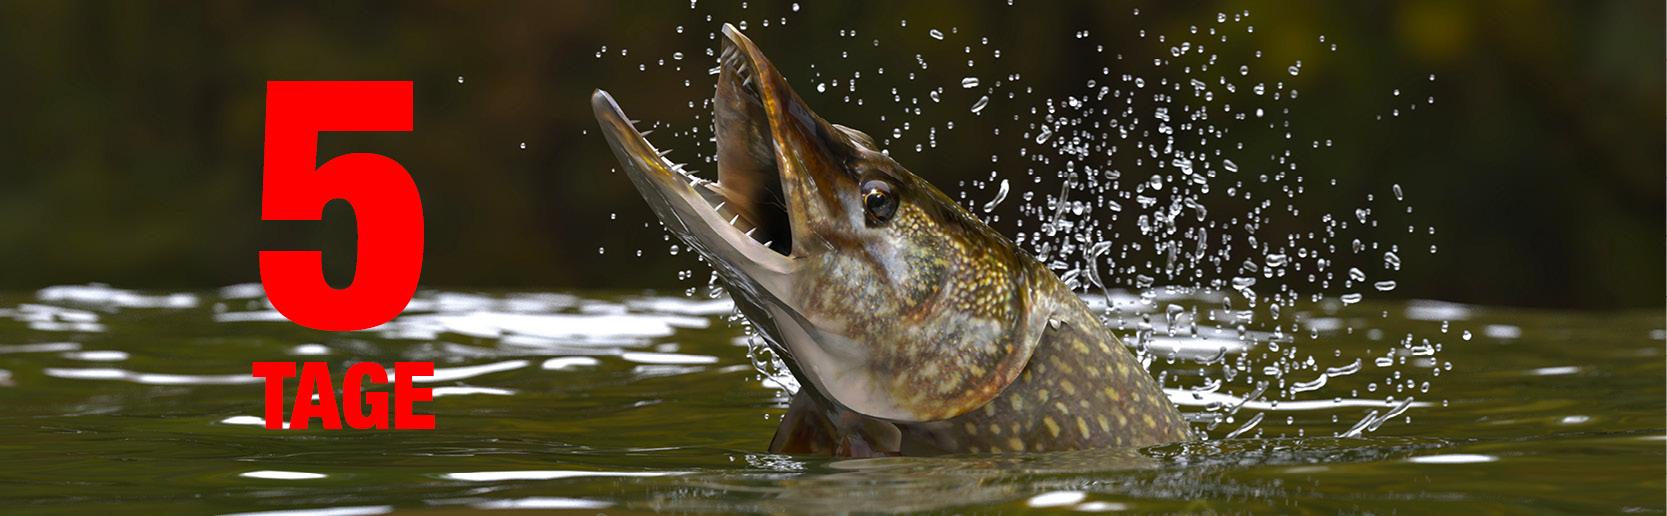 Catch more Fish_5_Beitragsbild-Anglerboard_600x240px (1).jpg